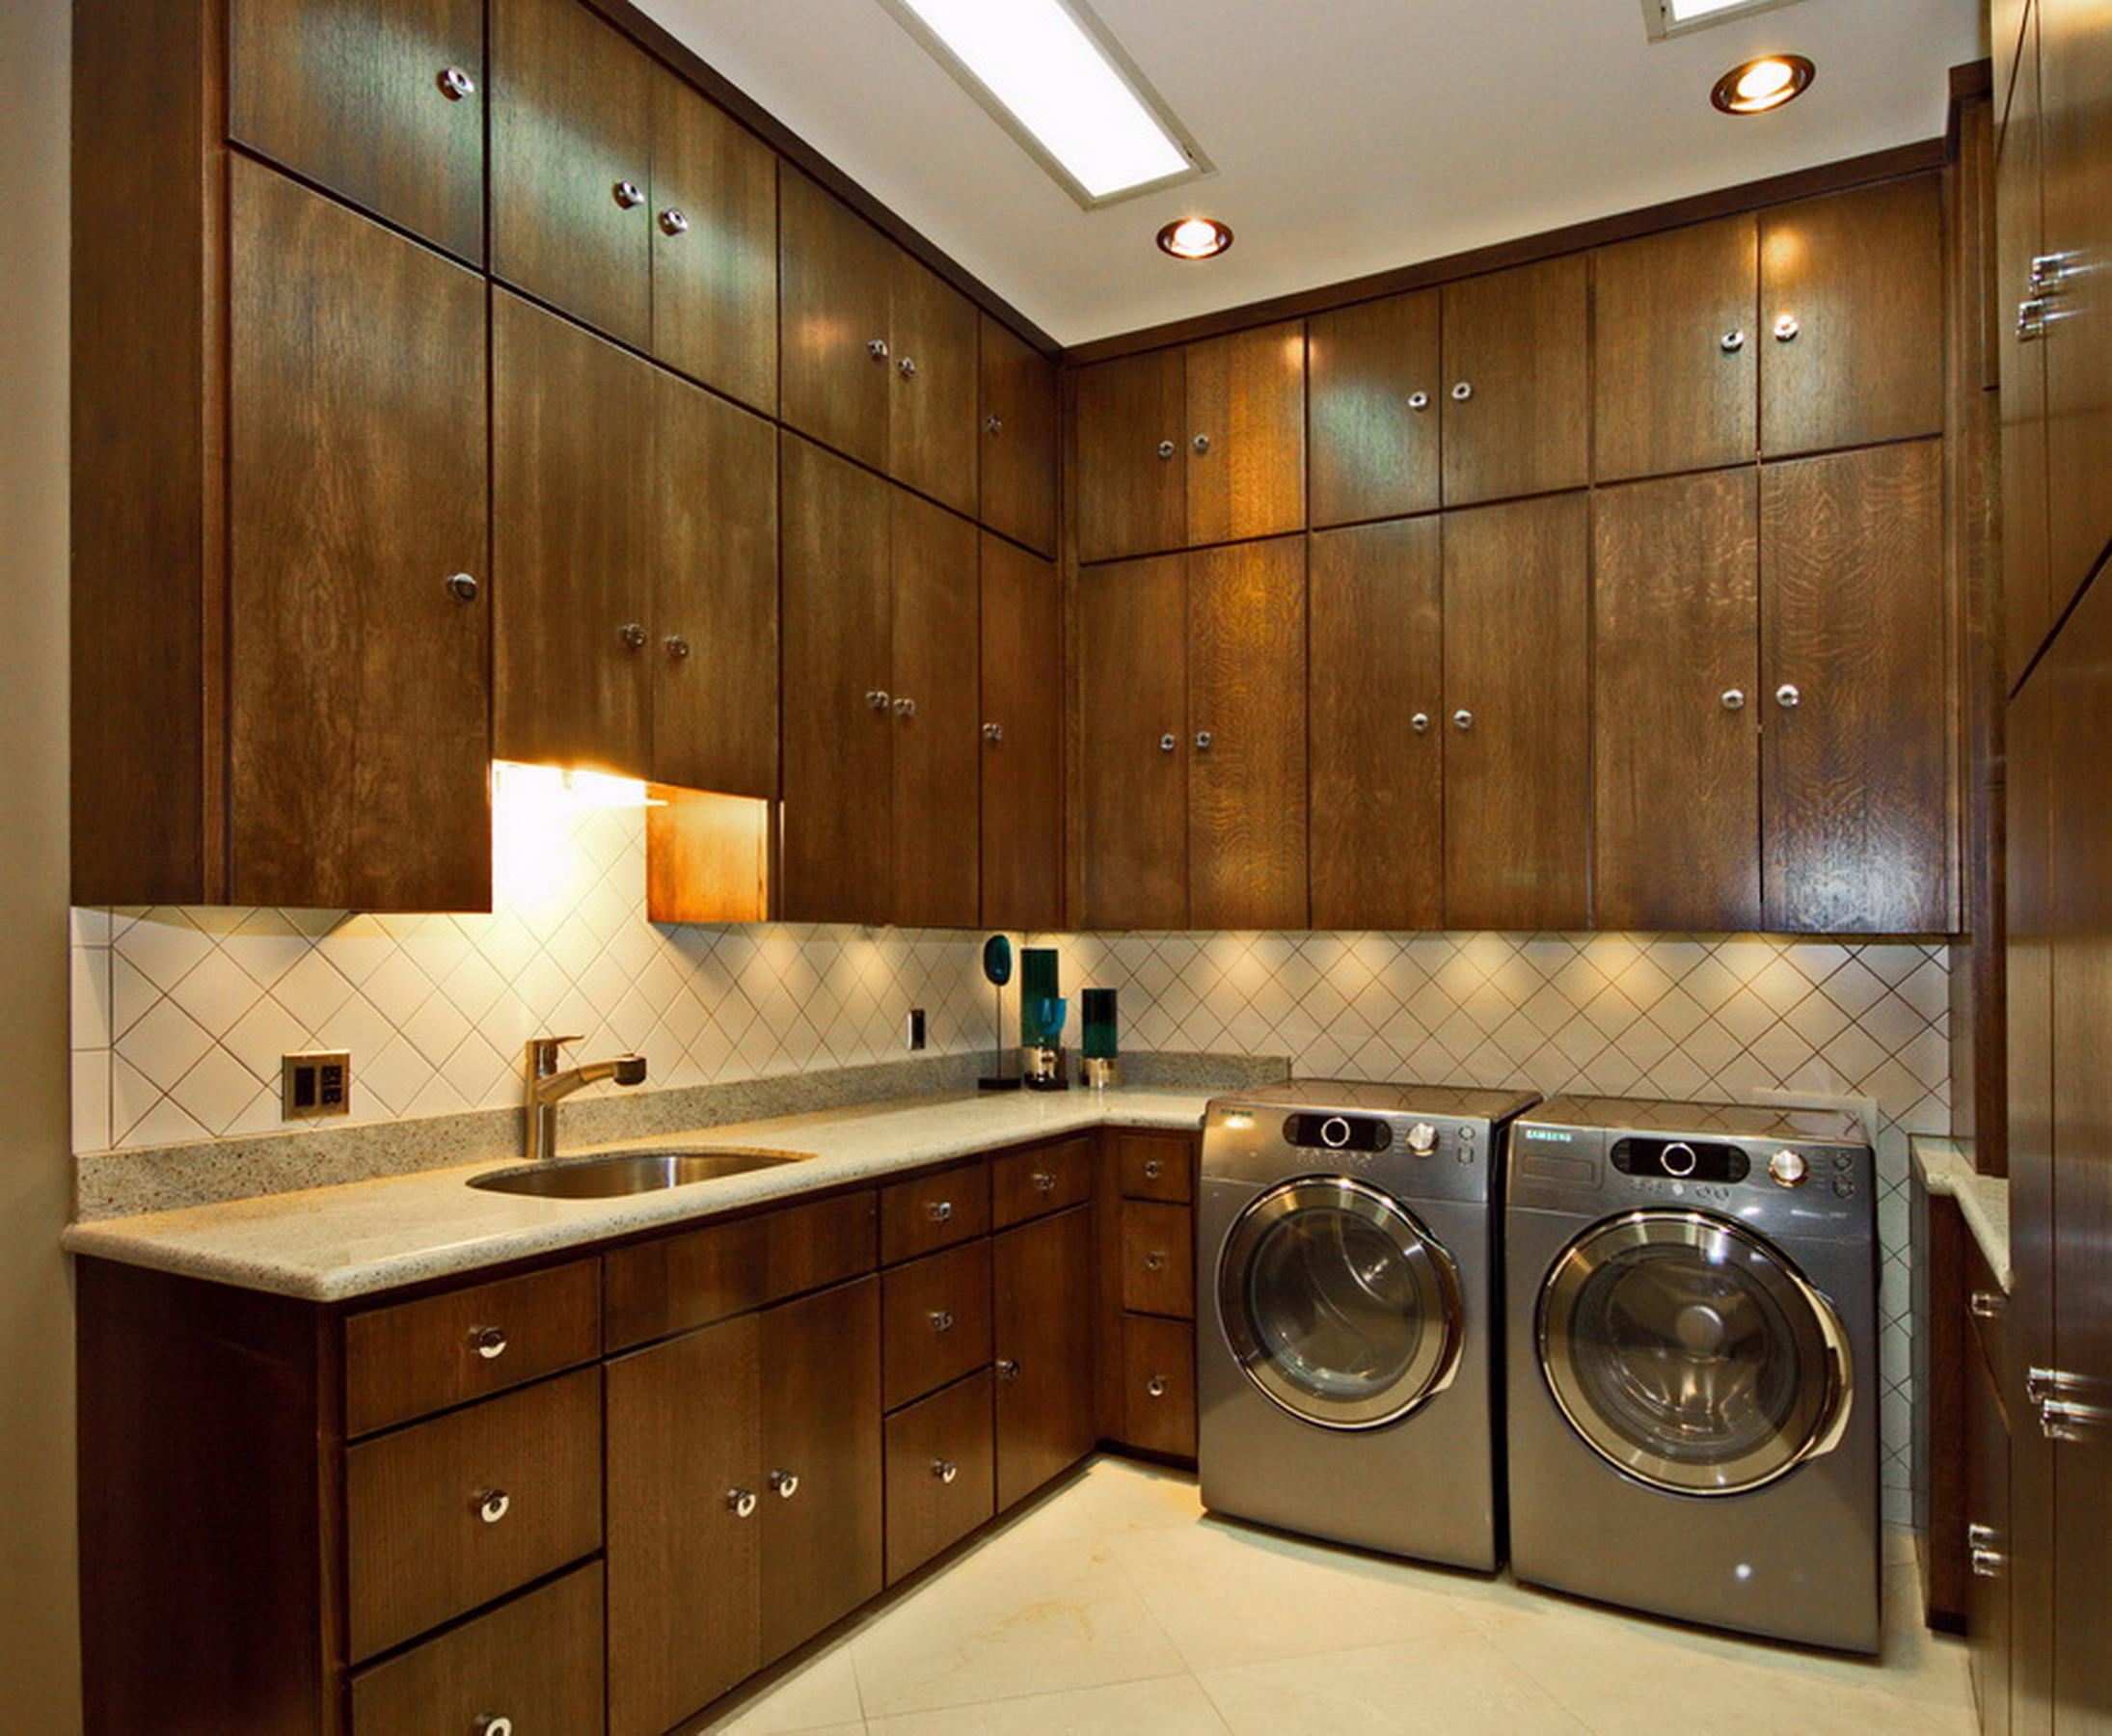 29-Ll Laundry Room